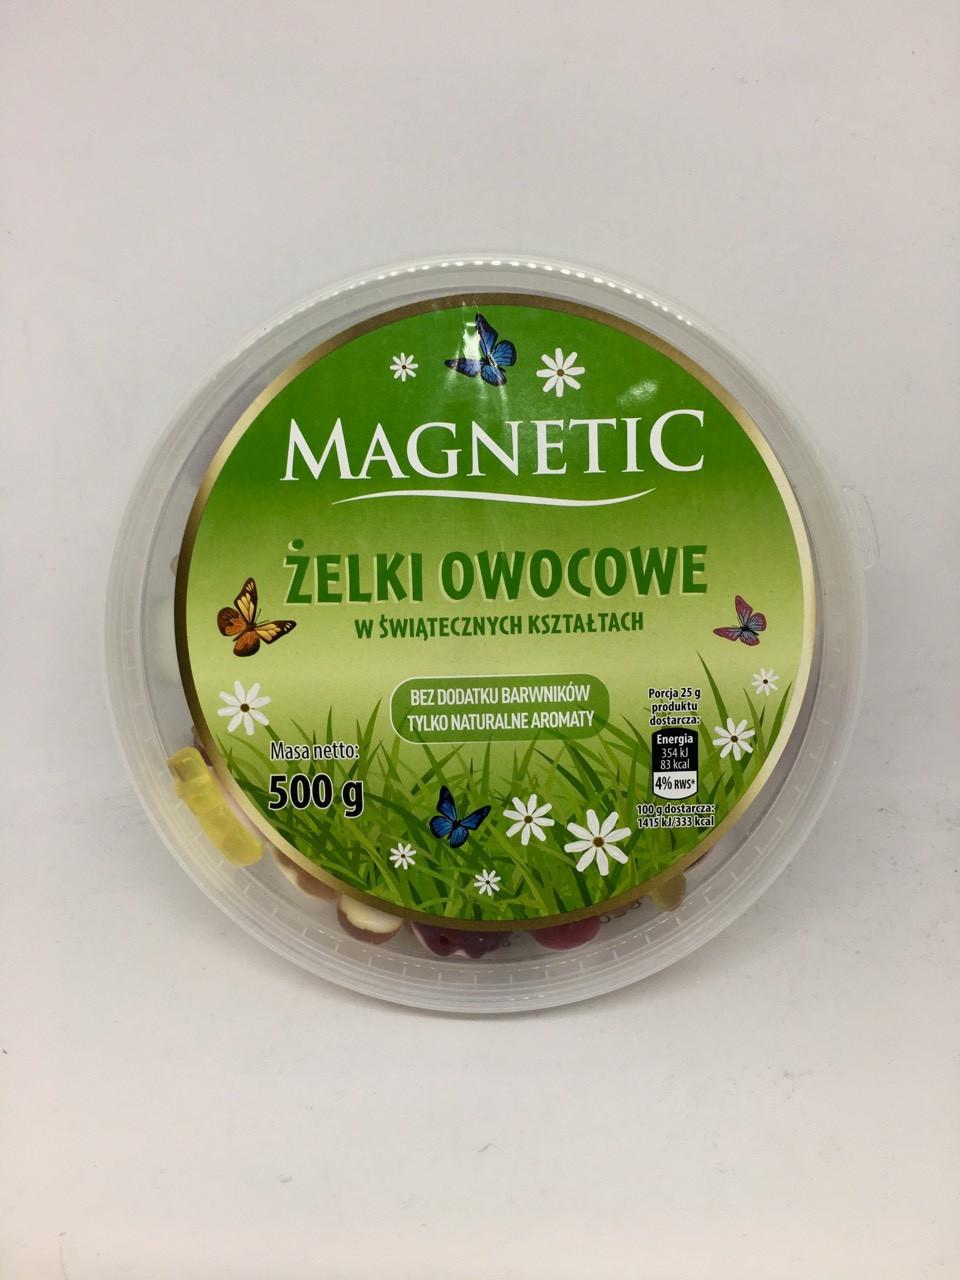 Magnetic Zelki Owocowe в сахаре 500 g